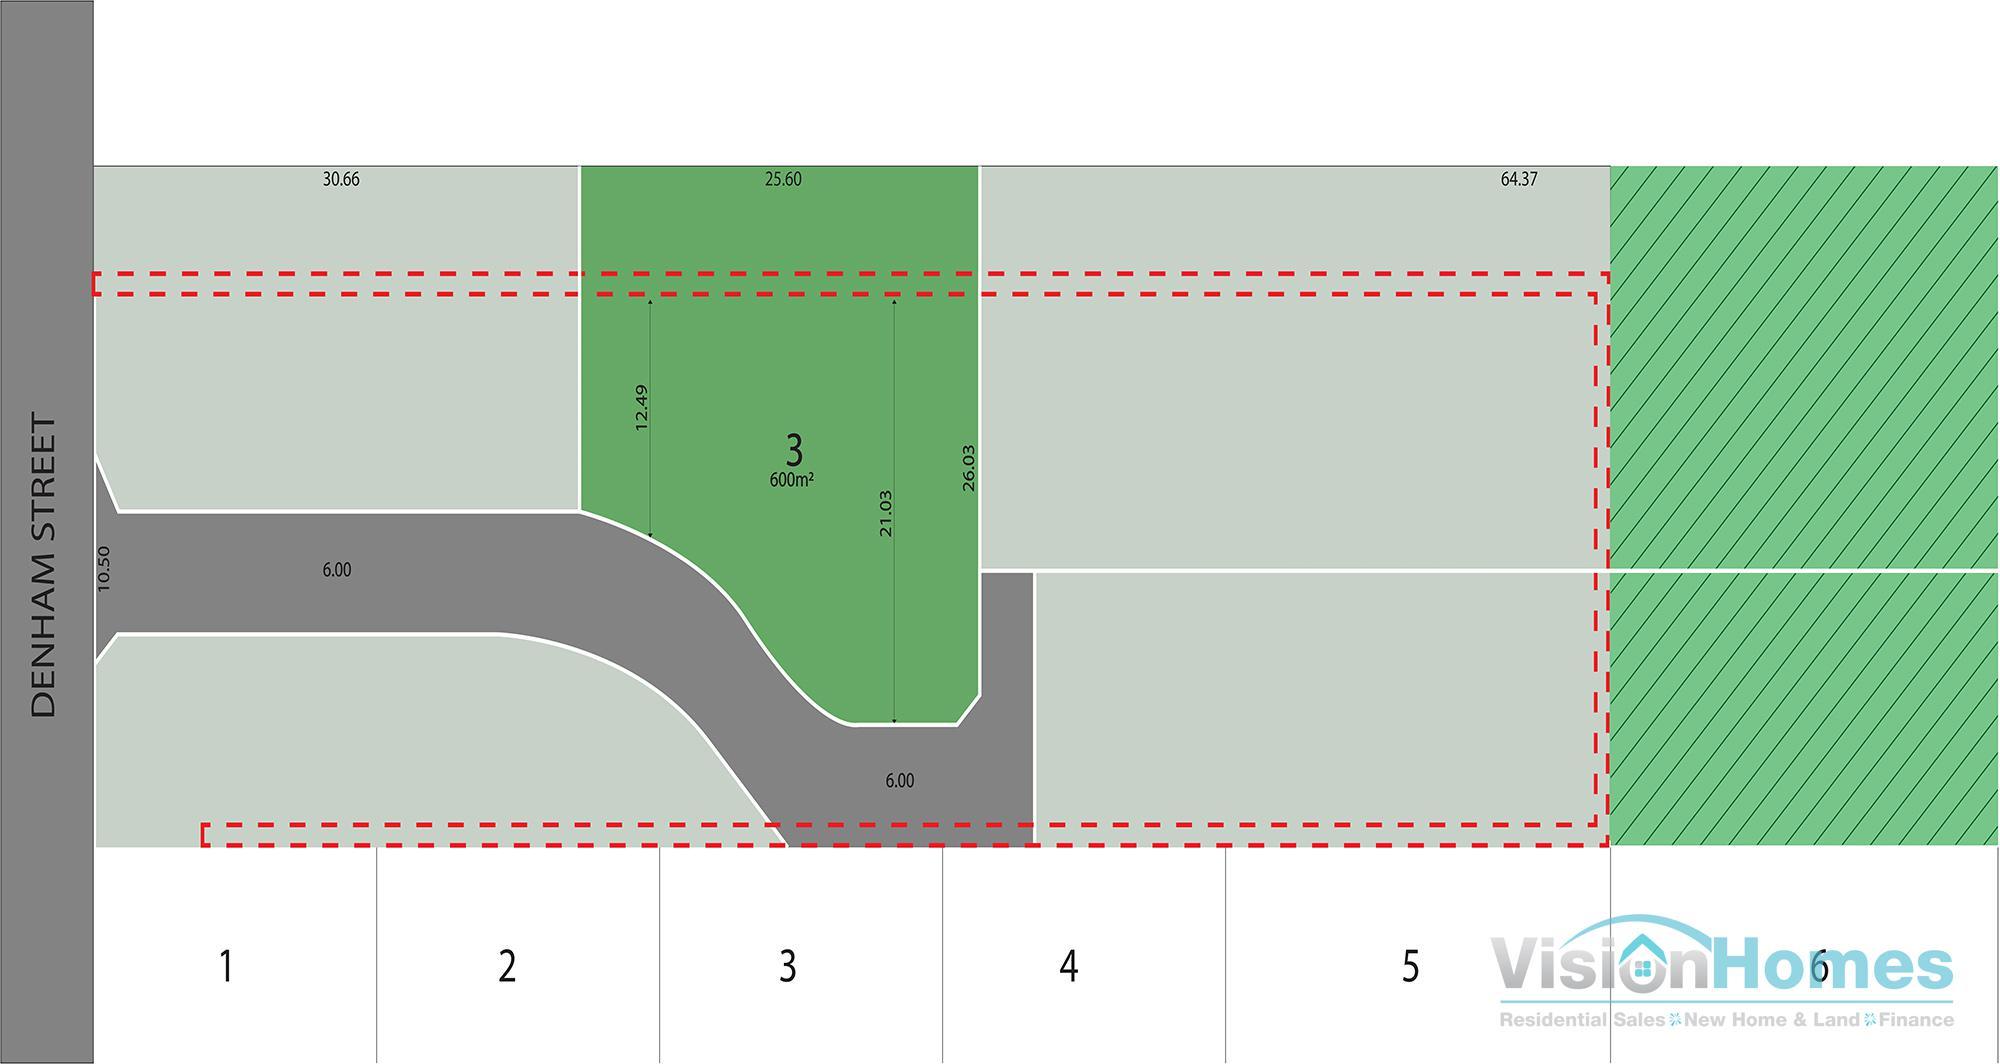 Lot 3 Denham Greens @ 149 – 600m2